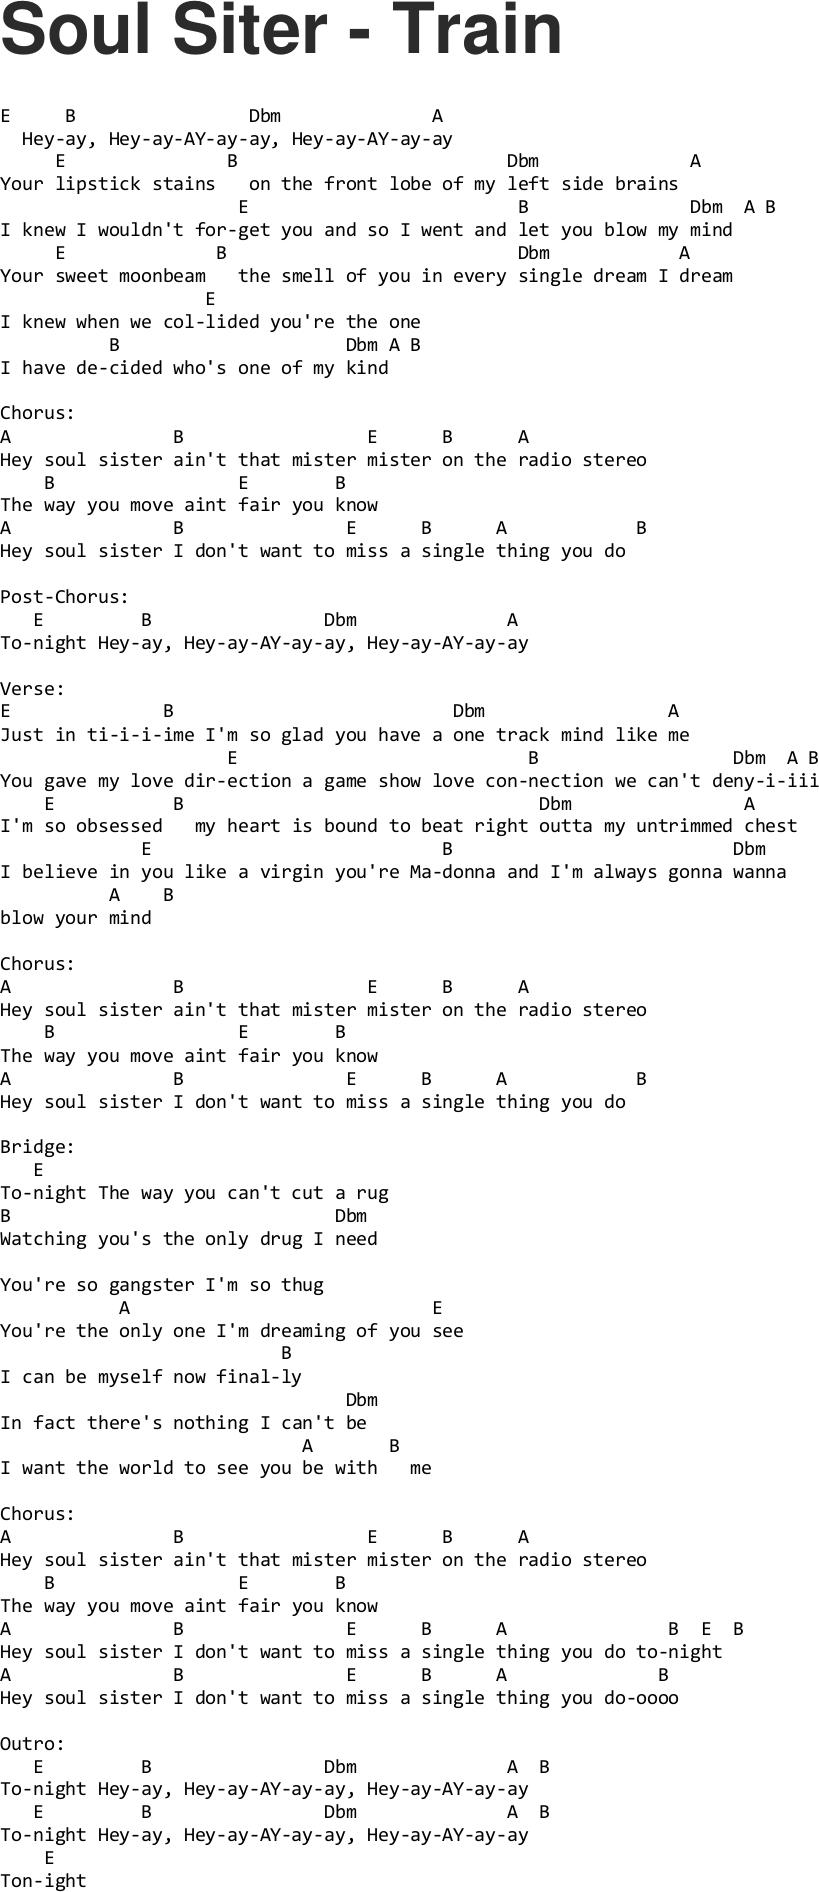 Bare the musical lyrics